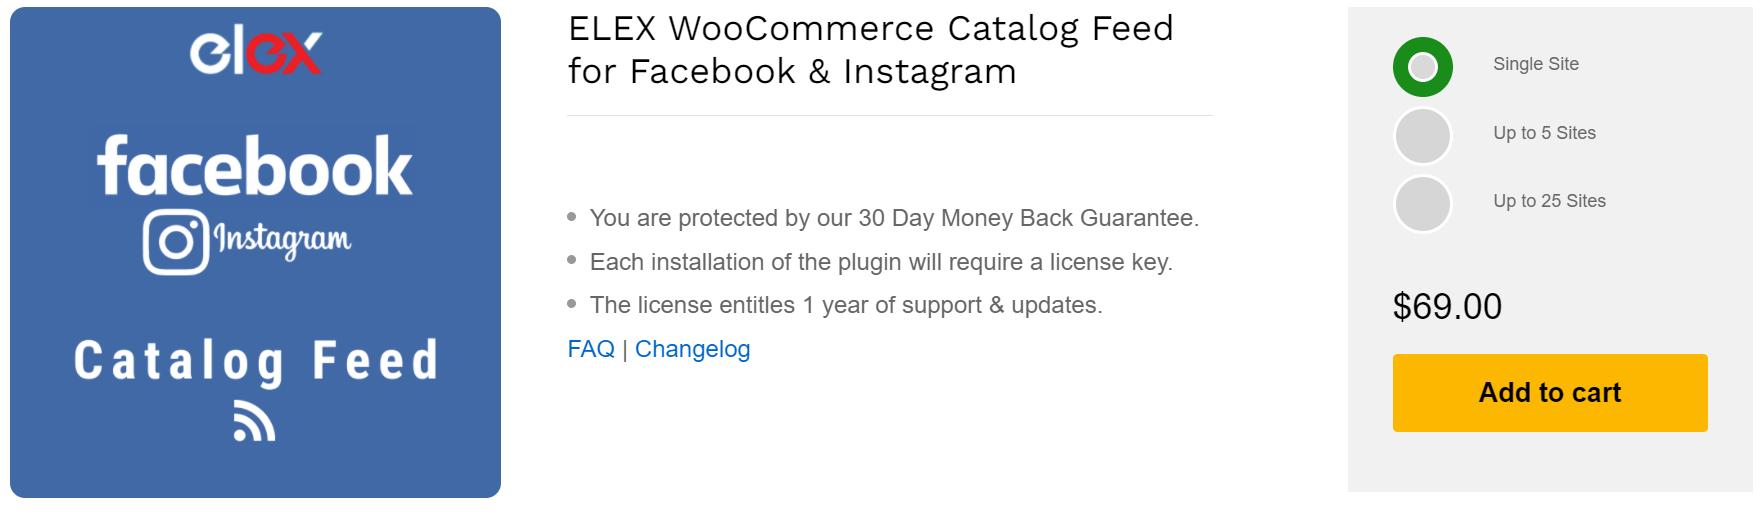 ELEX WooCommerce Catalog Feed Plugin for Facebook & Instagram